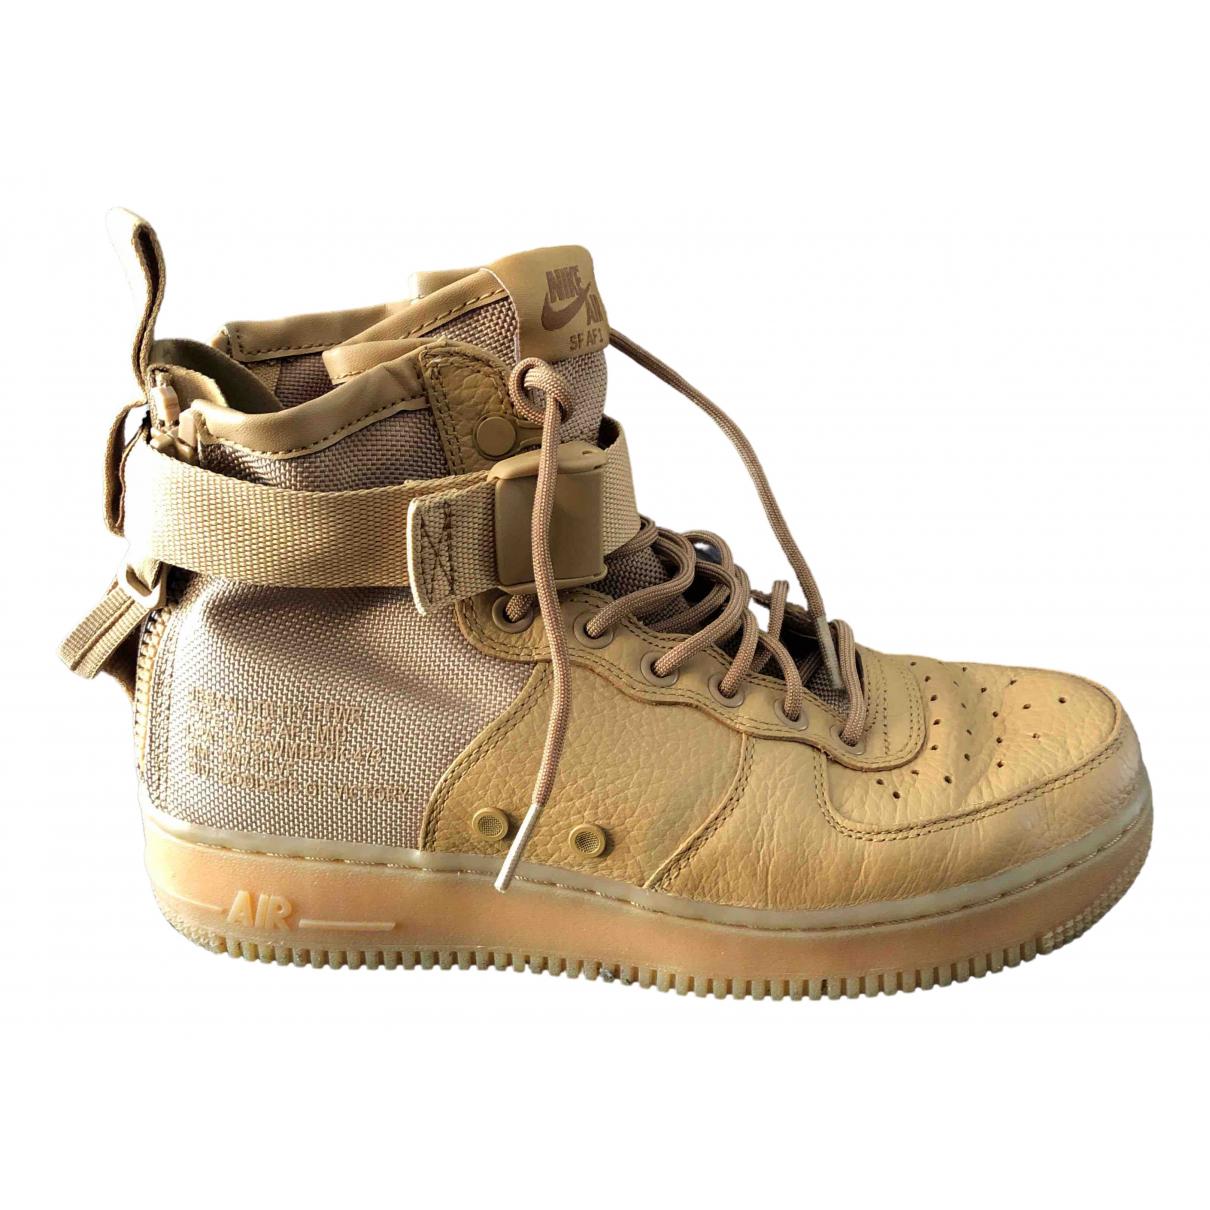 Nike SF Air Force 1 Brown Trainers for Women 40 EU